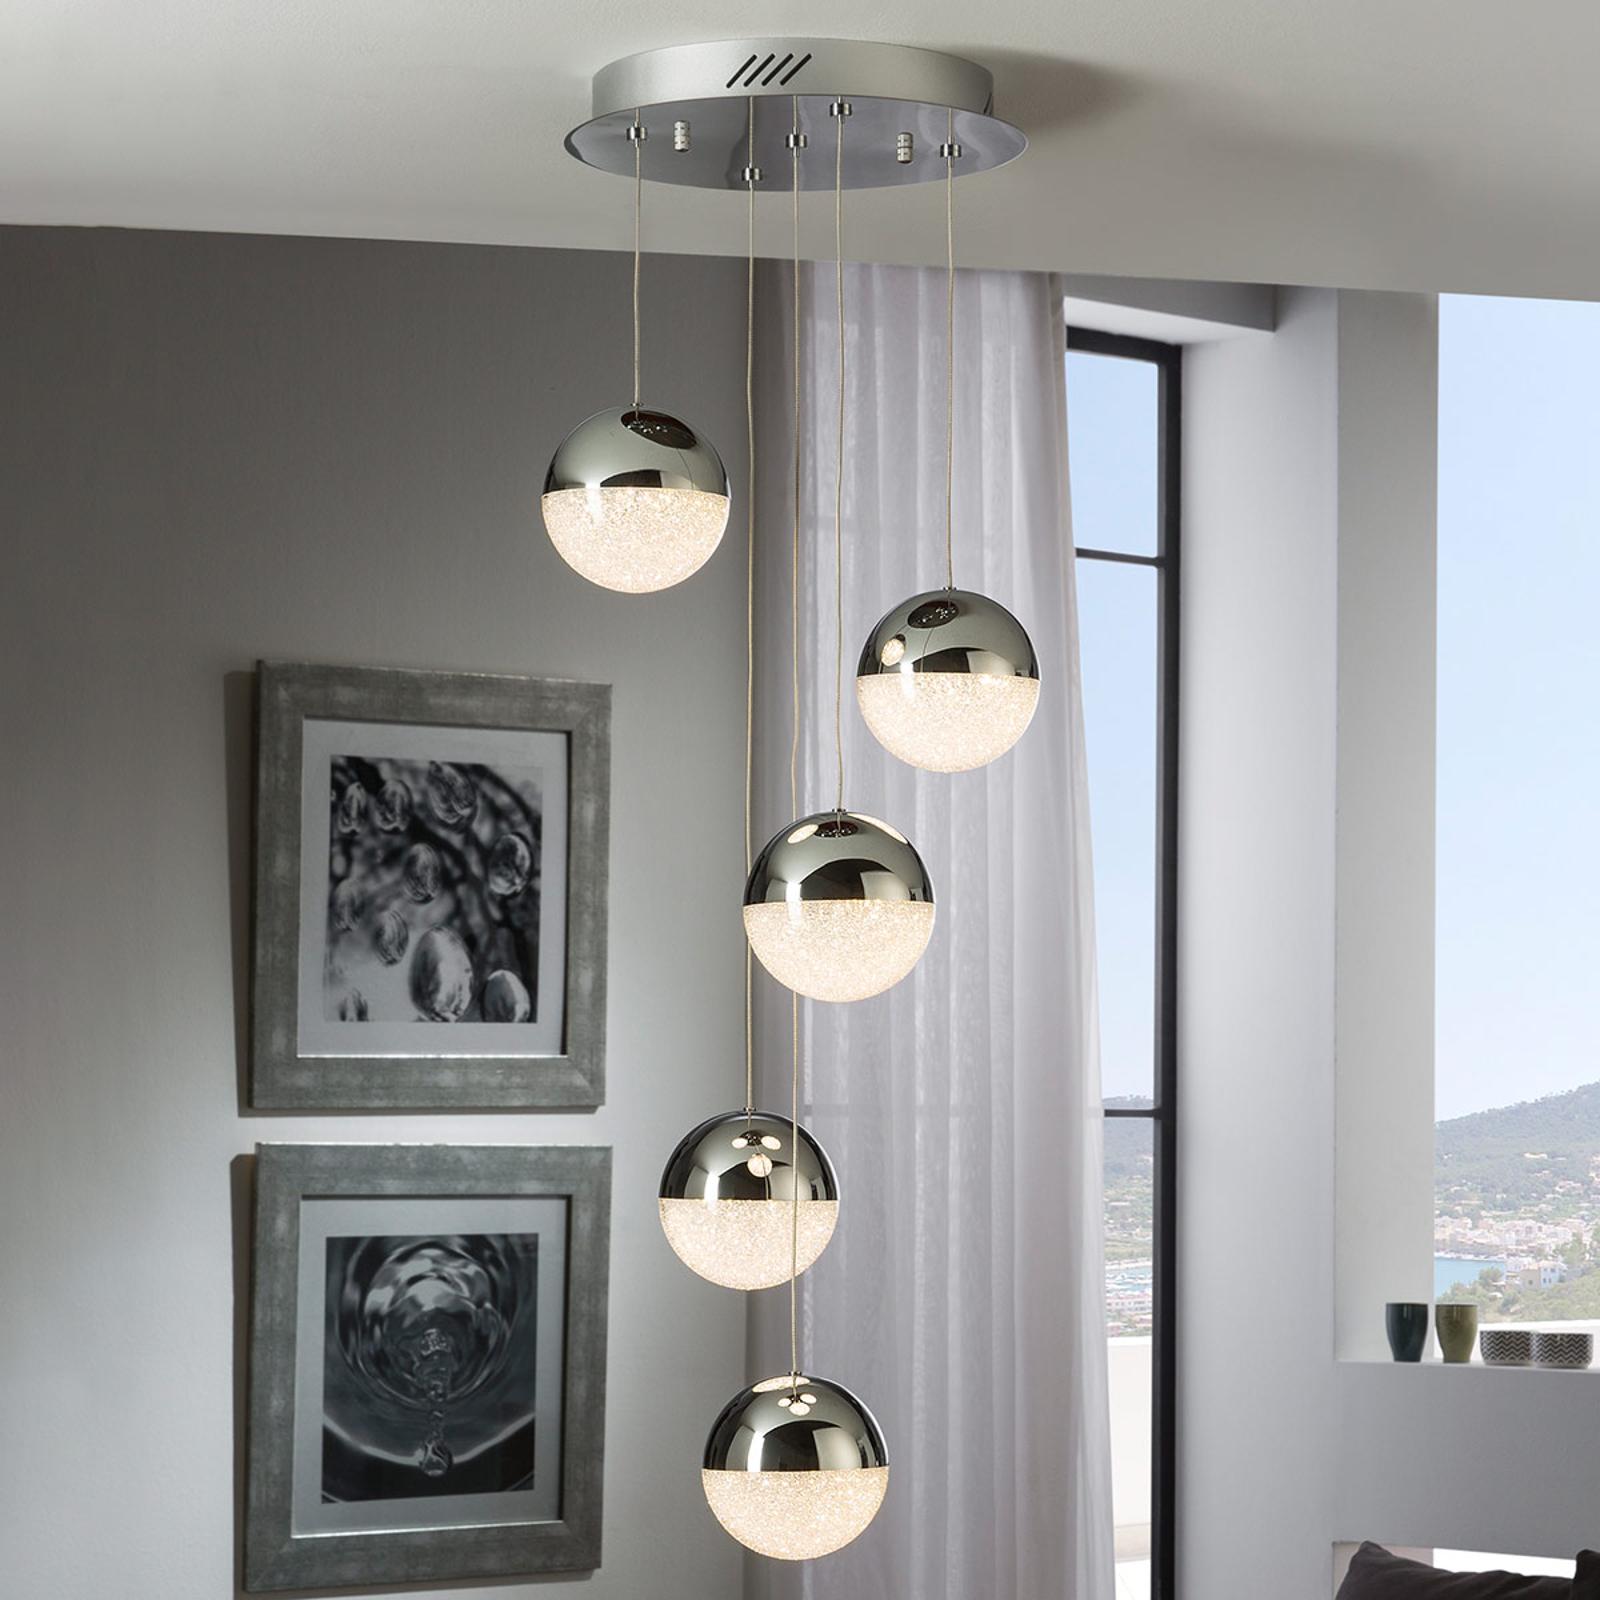 LED-riippuvalaisin Sphere, 5-lamppuinen, kromi